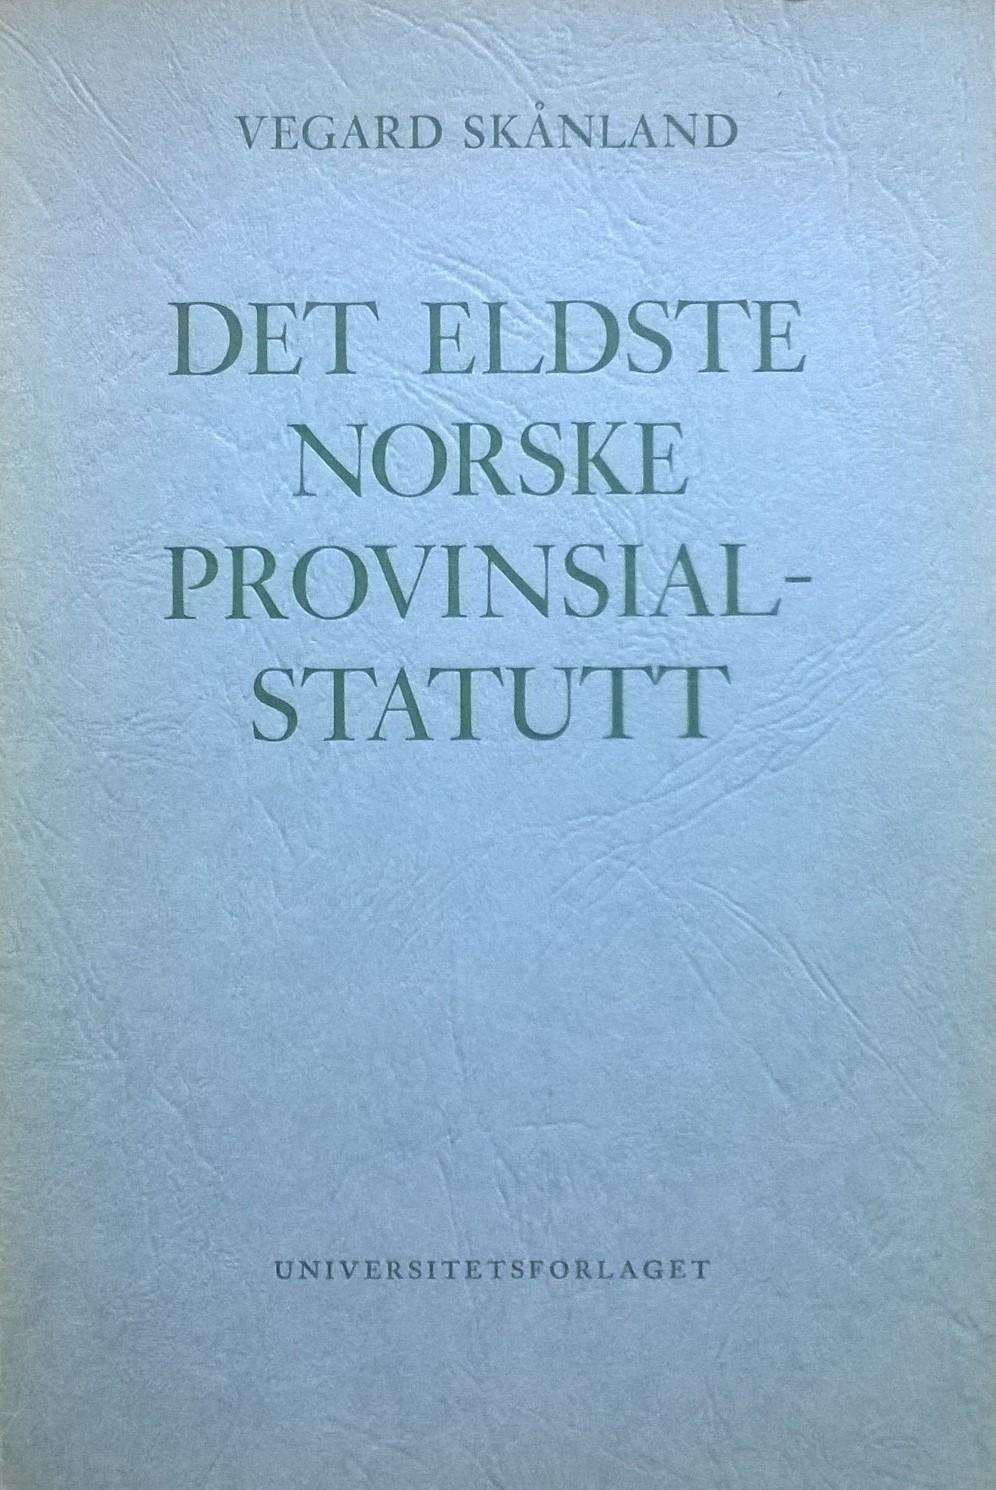 Skånland, Vegard Det eldste norske provinsialstatutt